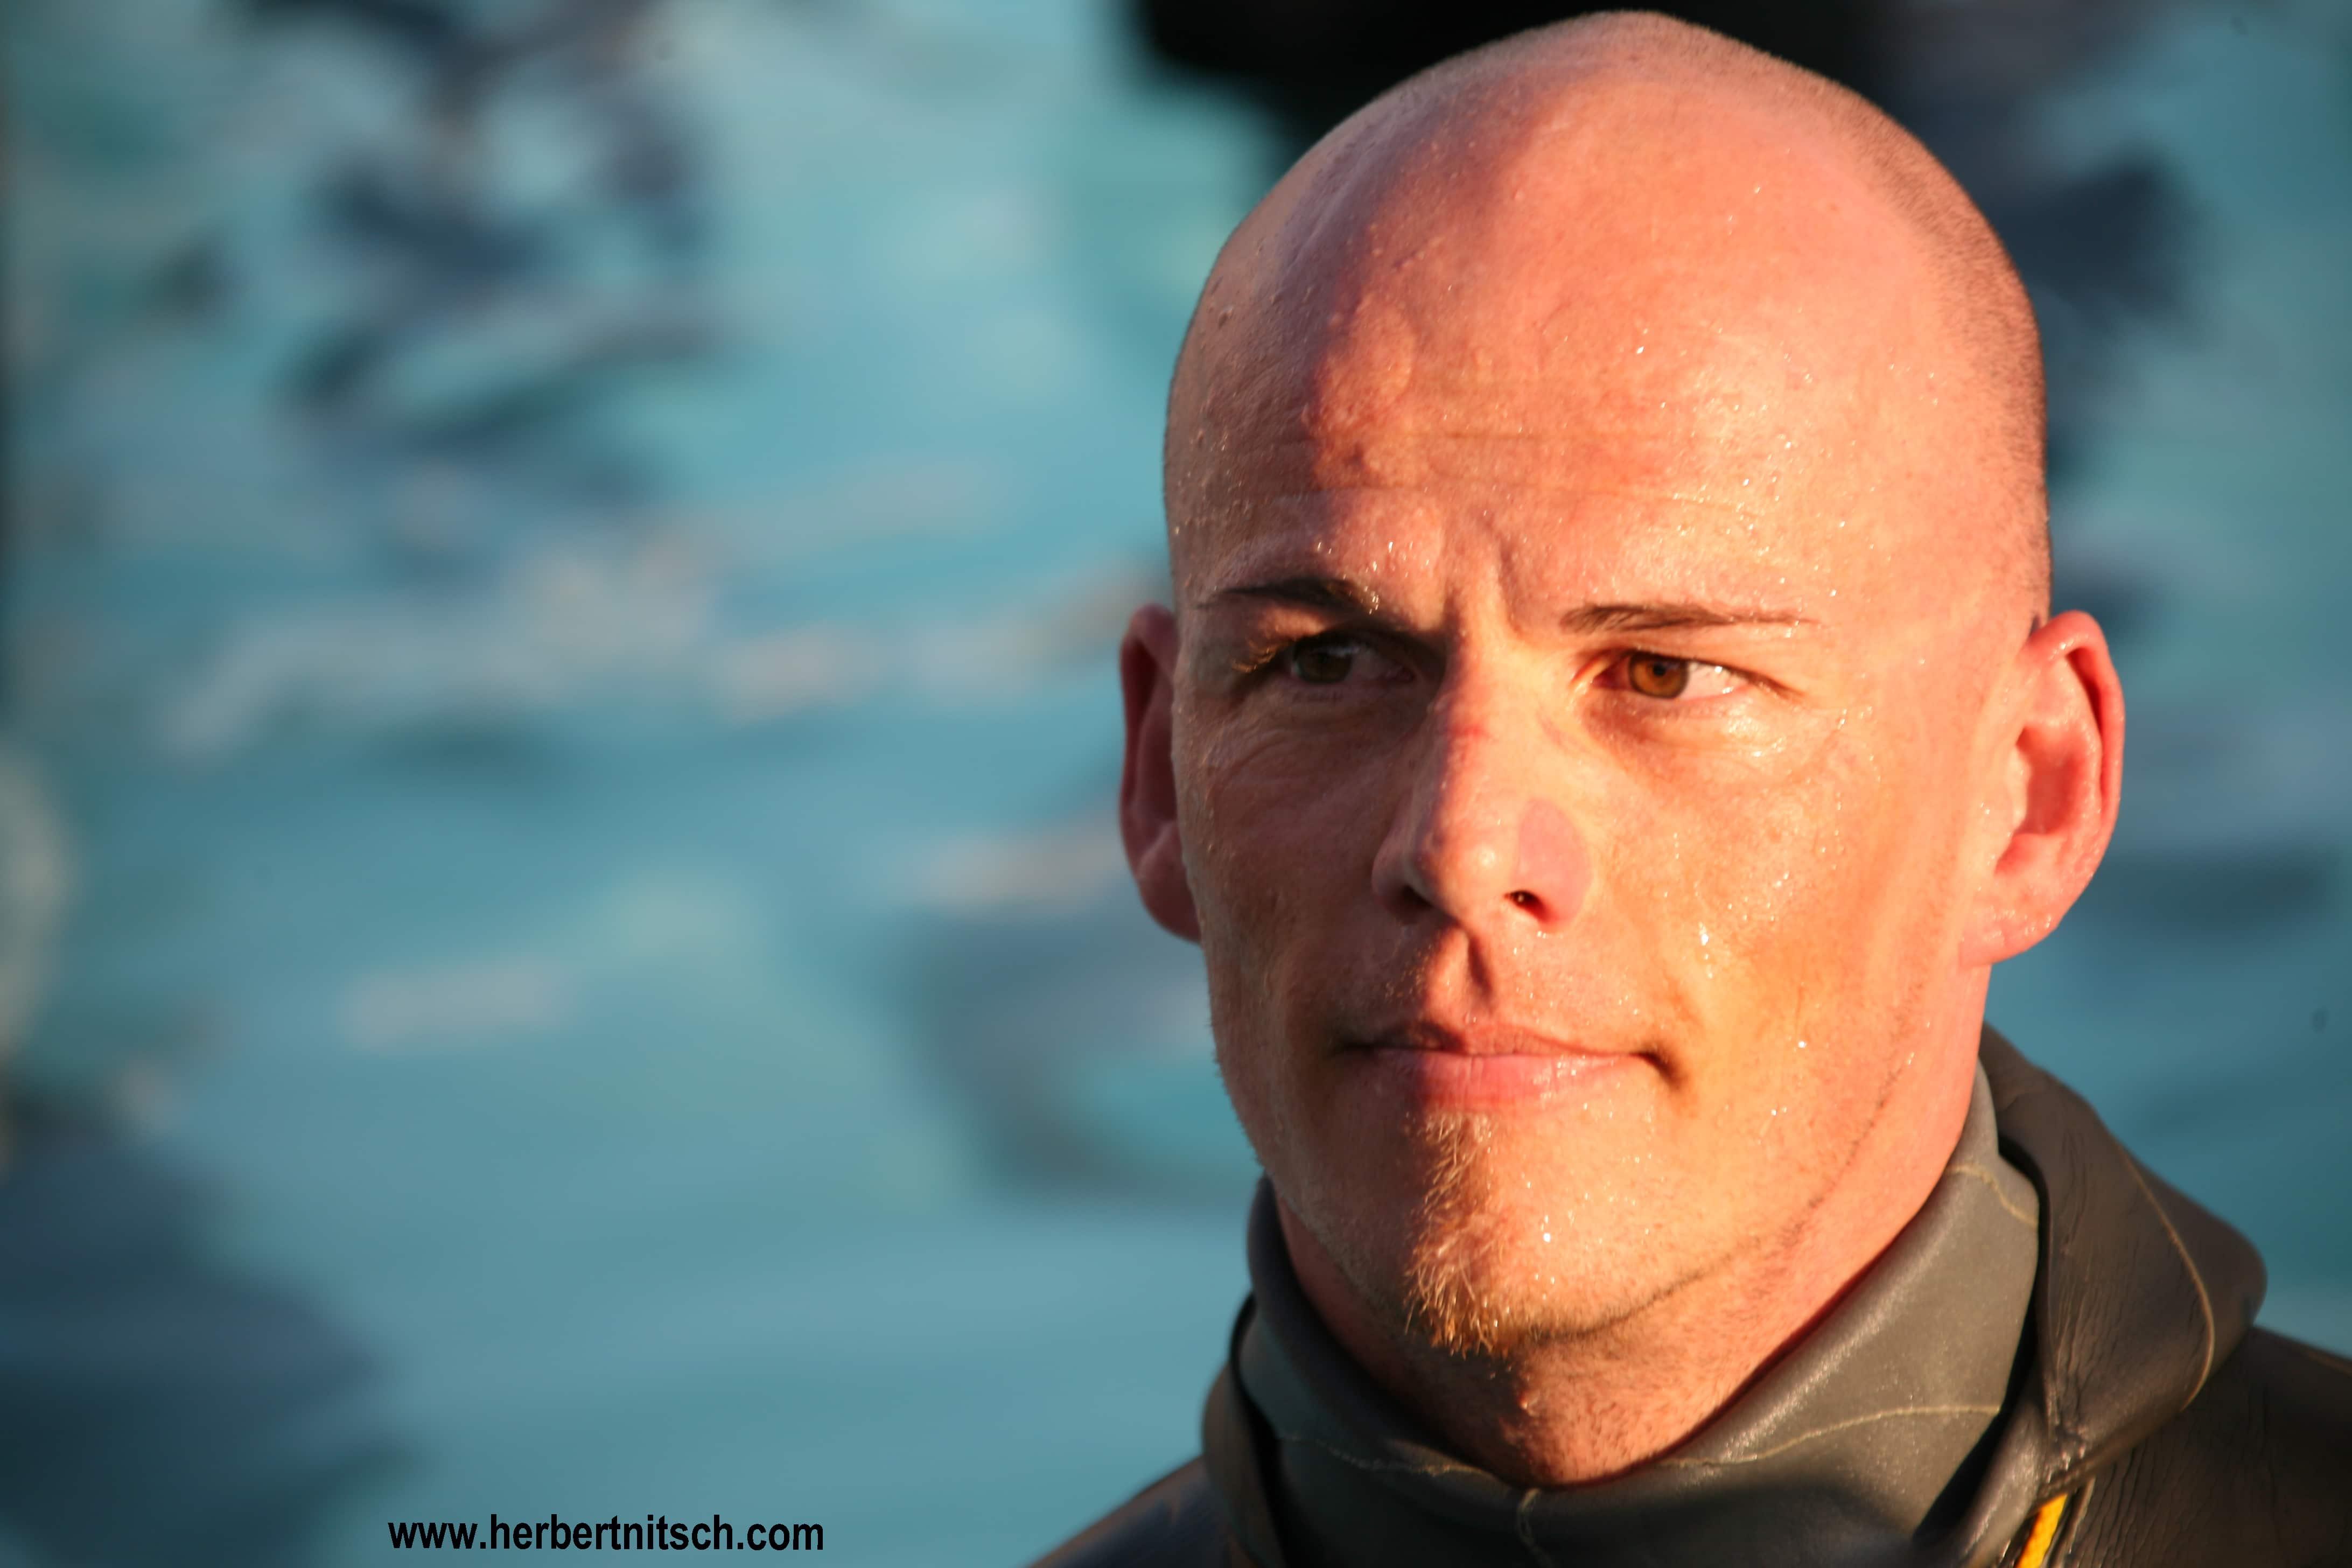 World Record For Holding Breath Underwater - Multiple world record holder herbert nitsch announces new workshop